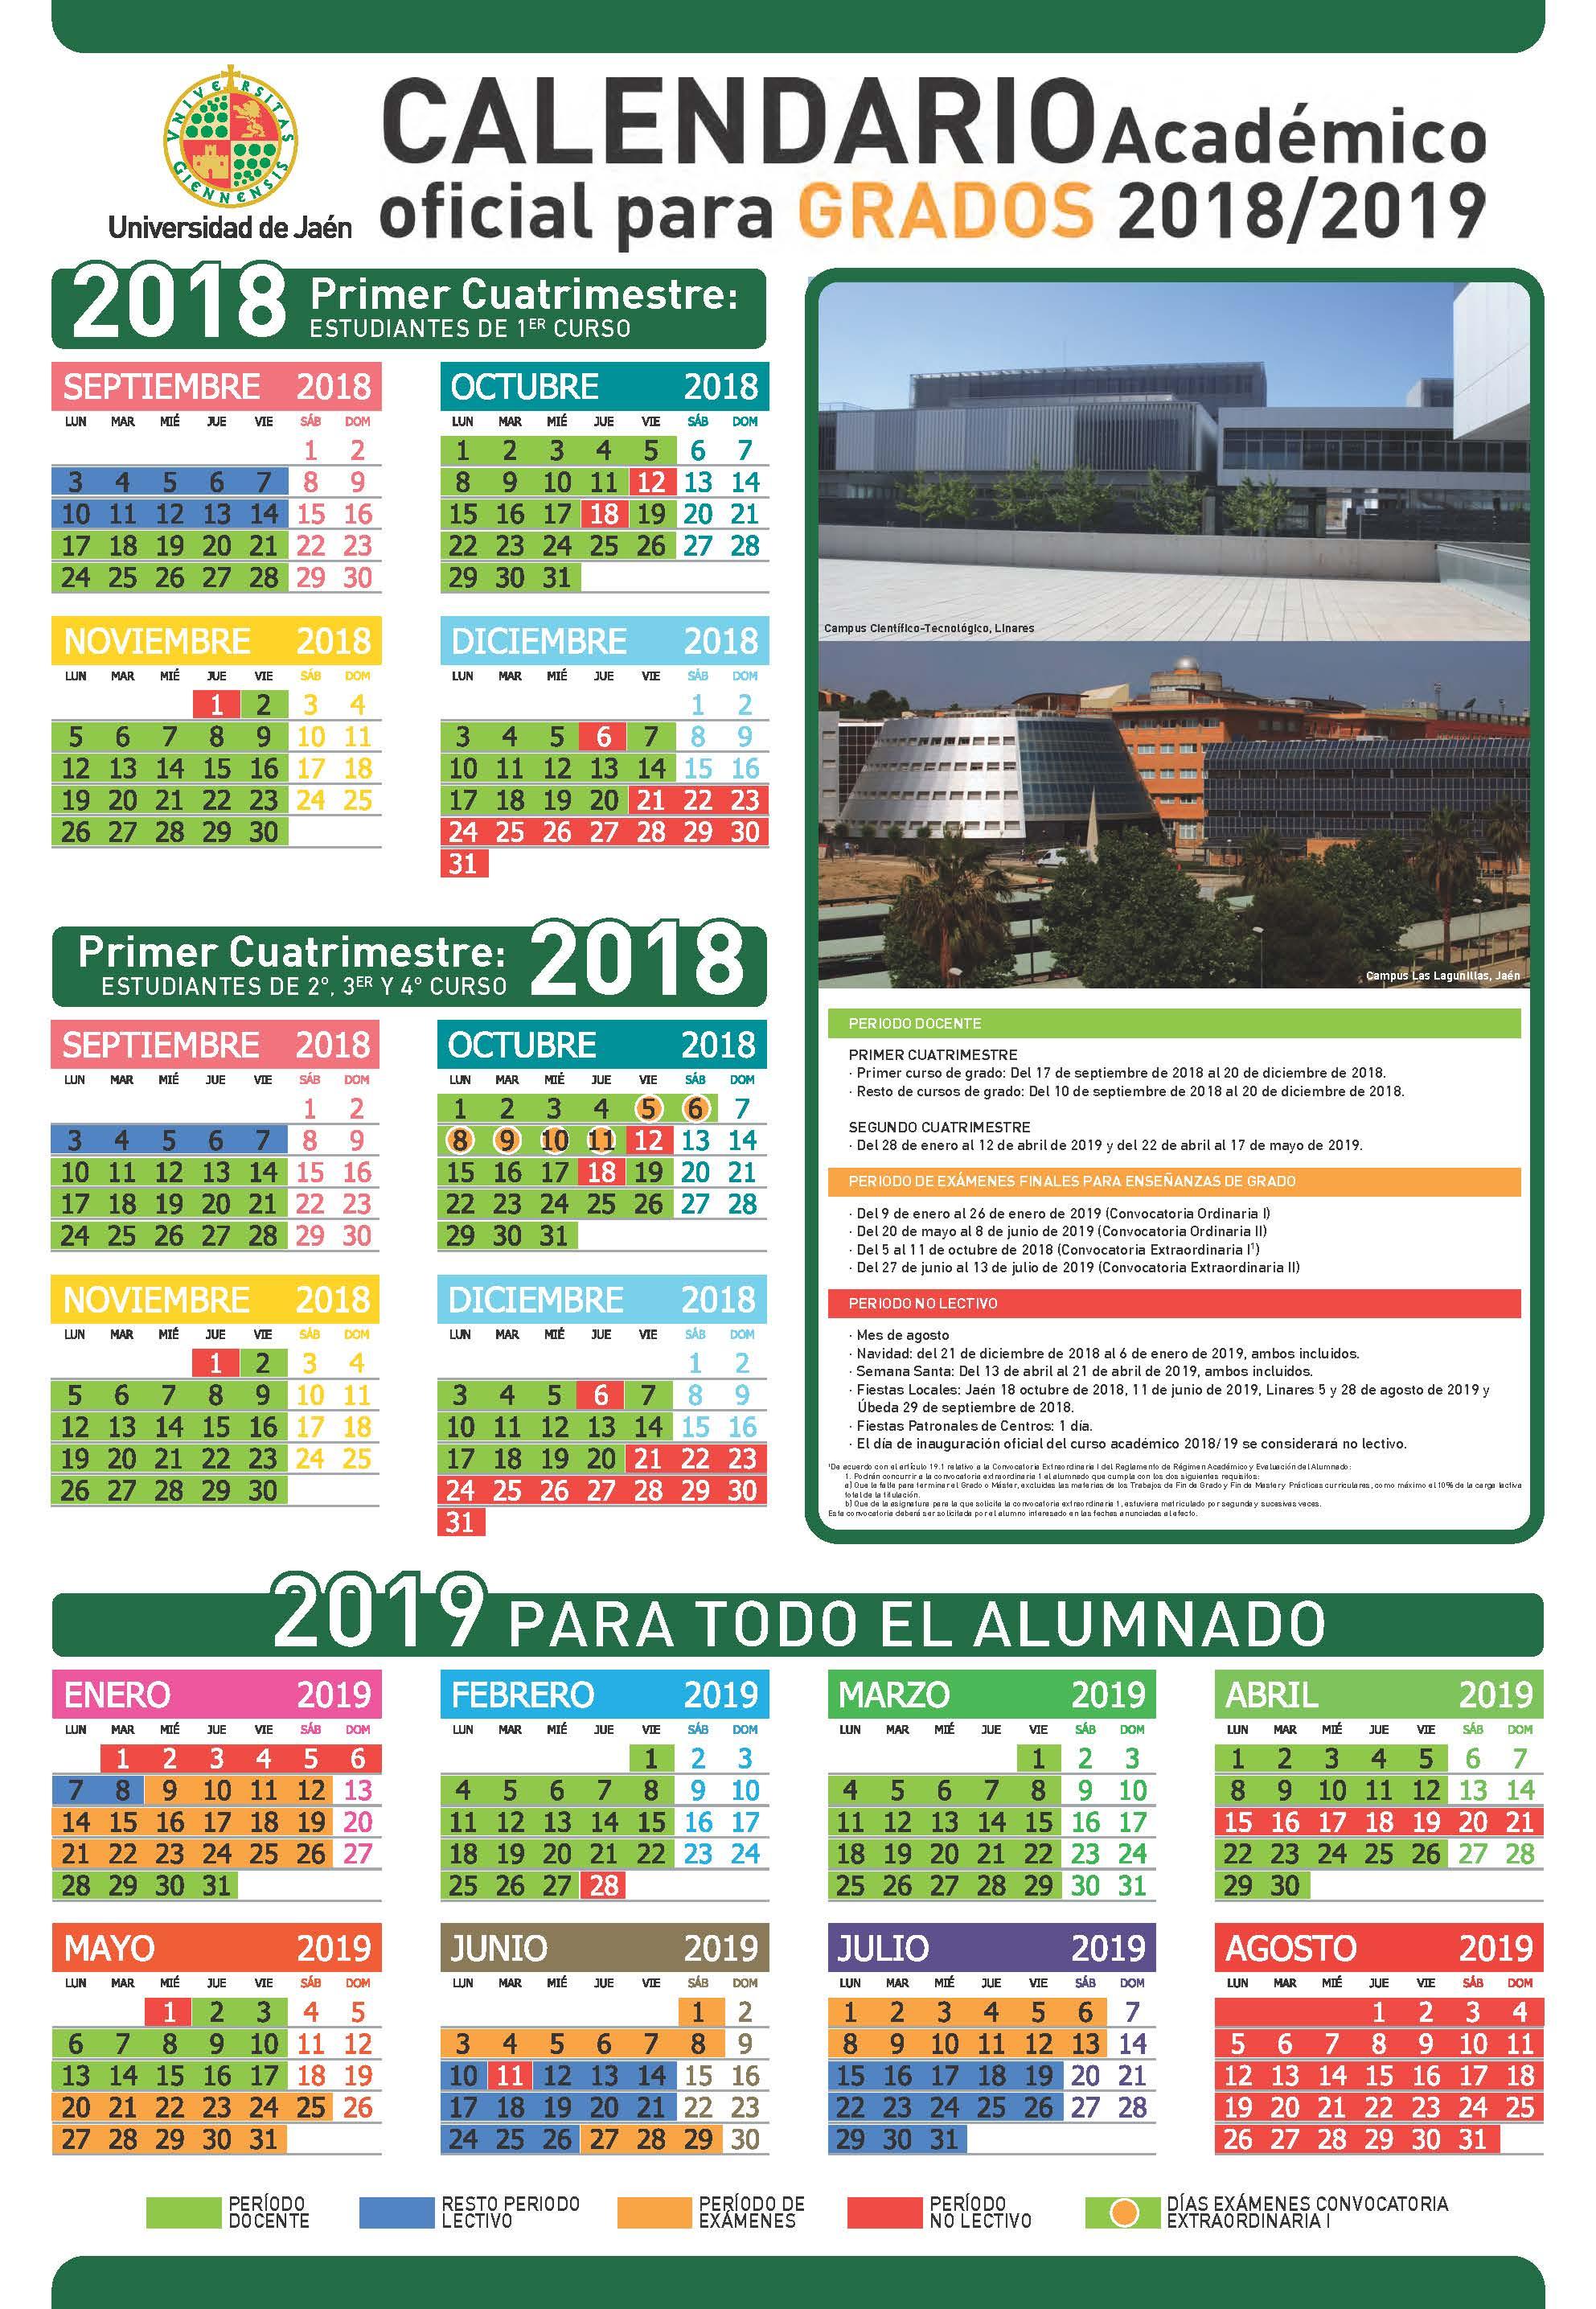 Calendario Ujaen.Calendario Academico Curso 2018 2019 Facultad De Ciencias